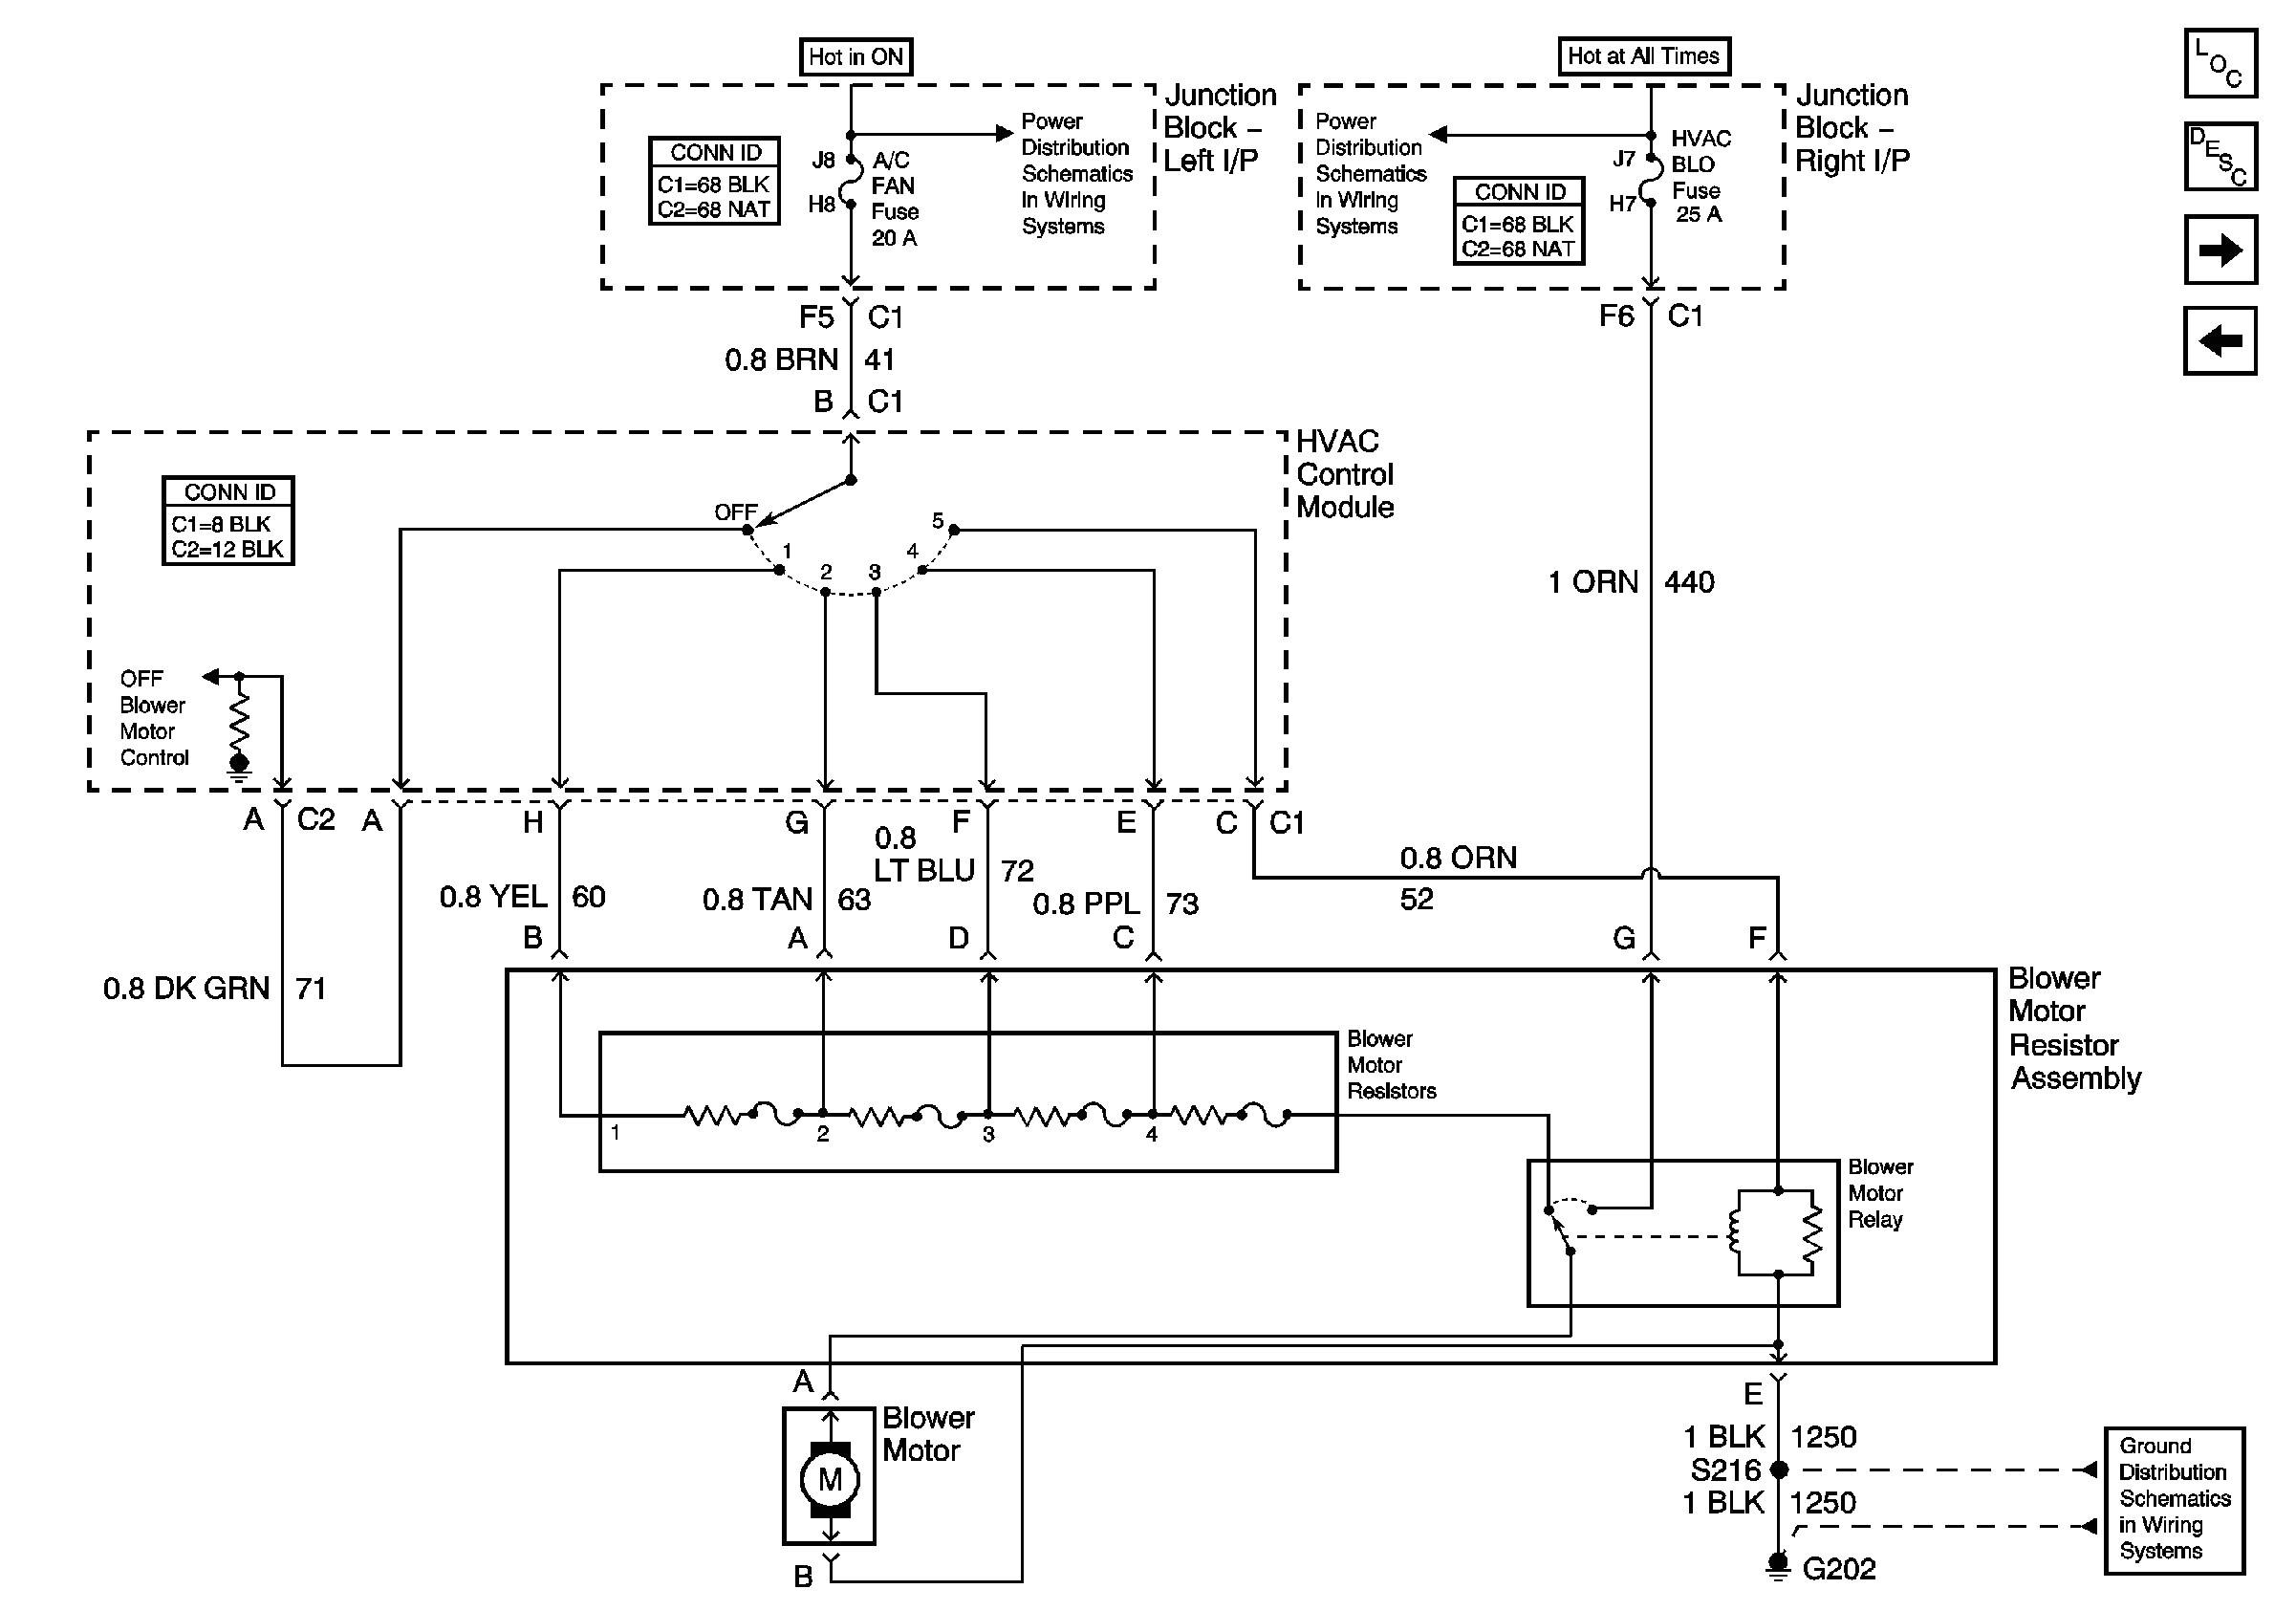 2004 impala wiring diagram premium wiring diagram blog 2003 chevy impala wiring diagram wiring diagram today